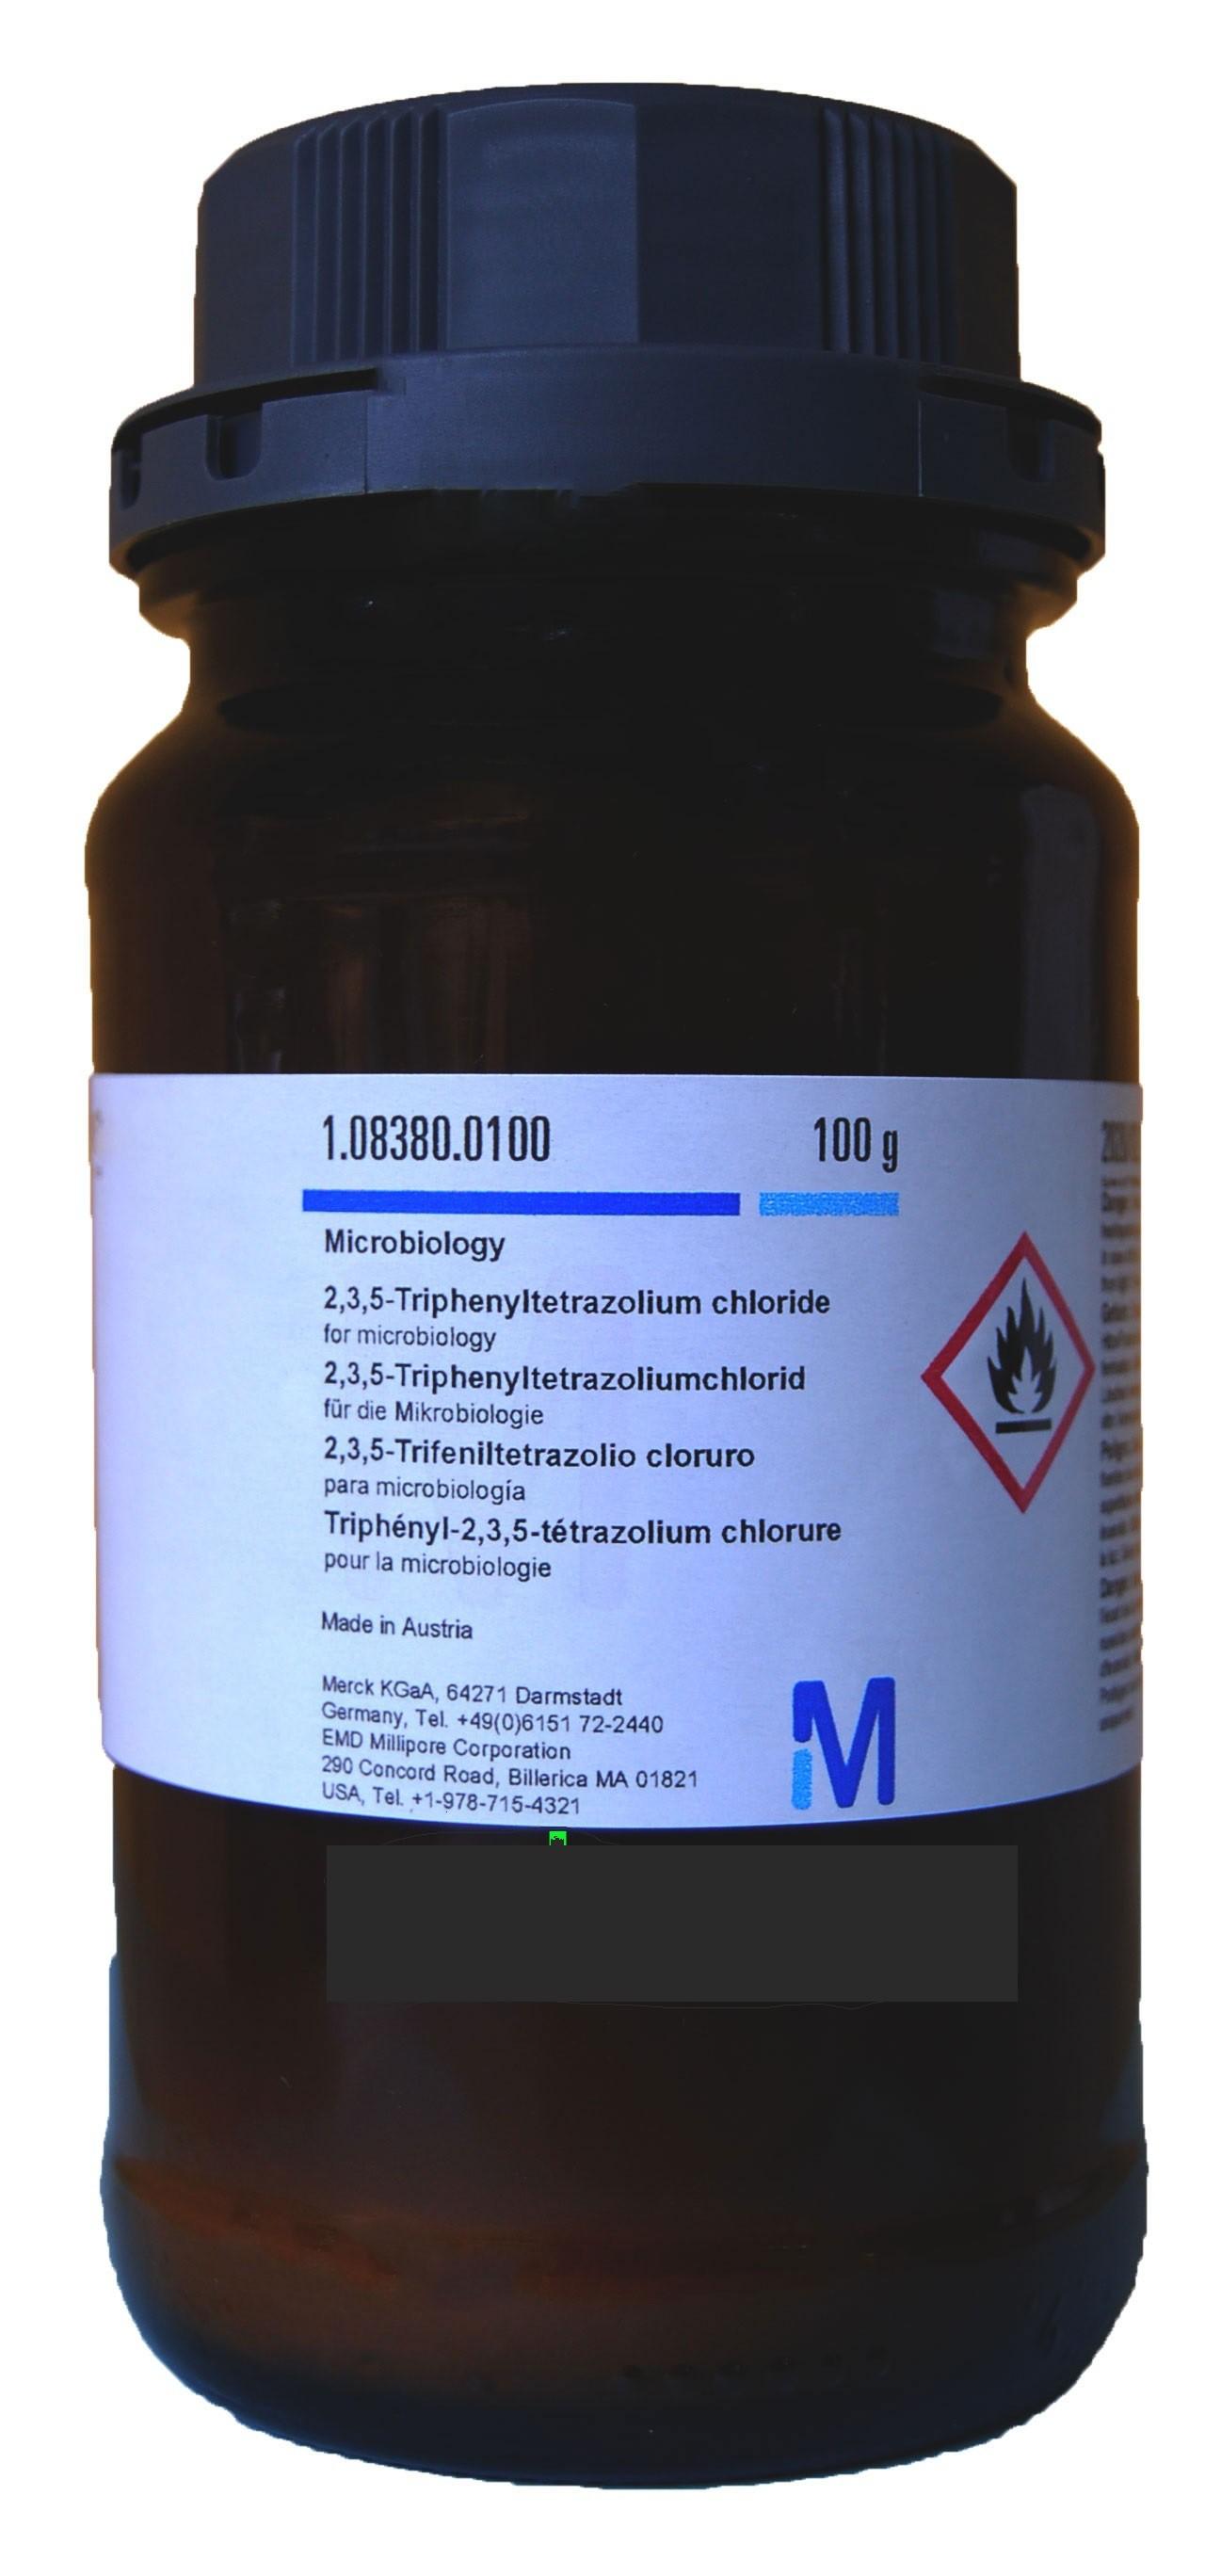 2,3,5-Triphenyltetrazolium chloride for microbiology 100g Merck